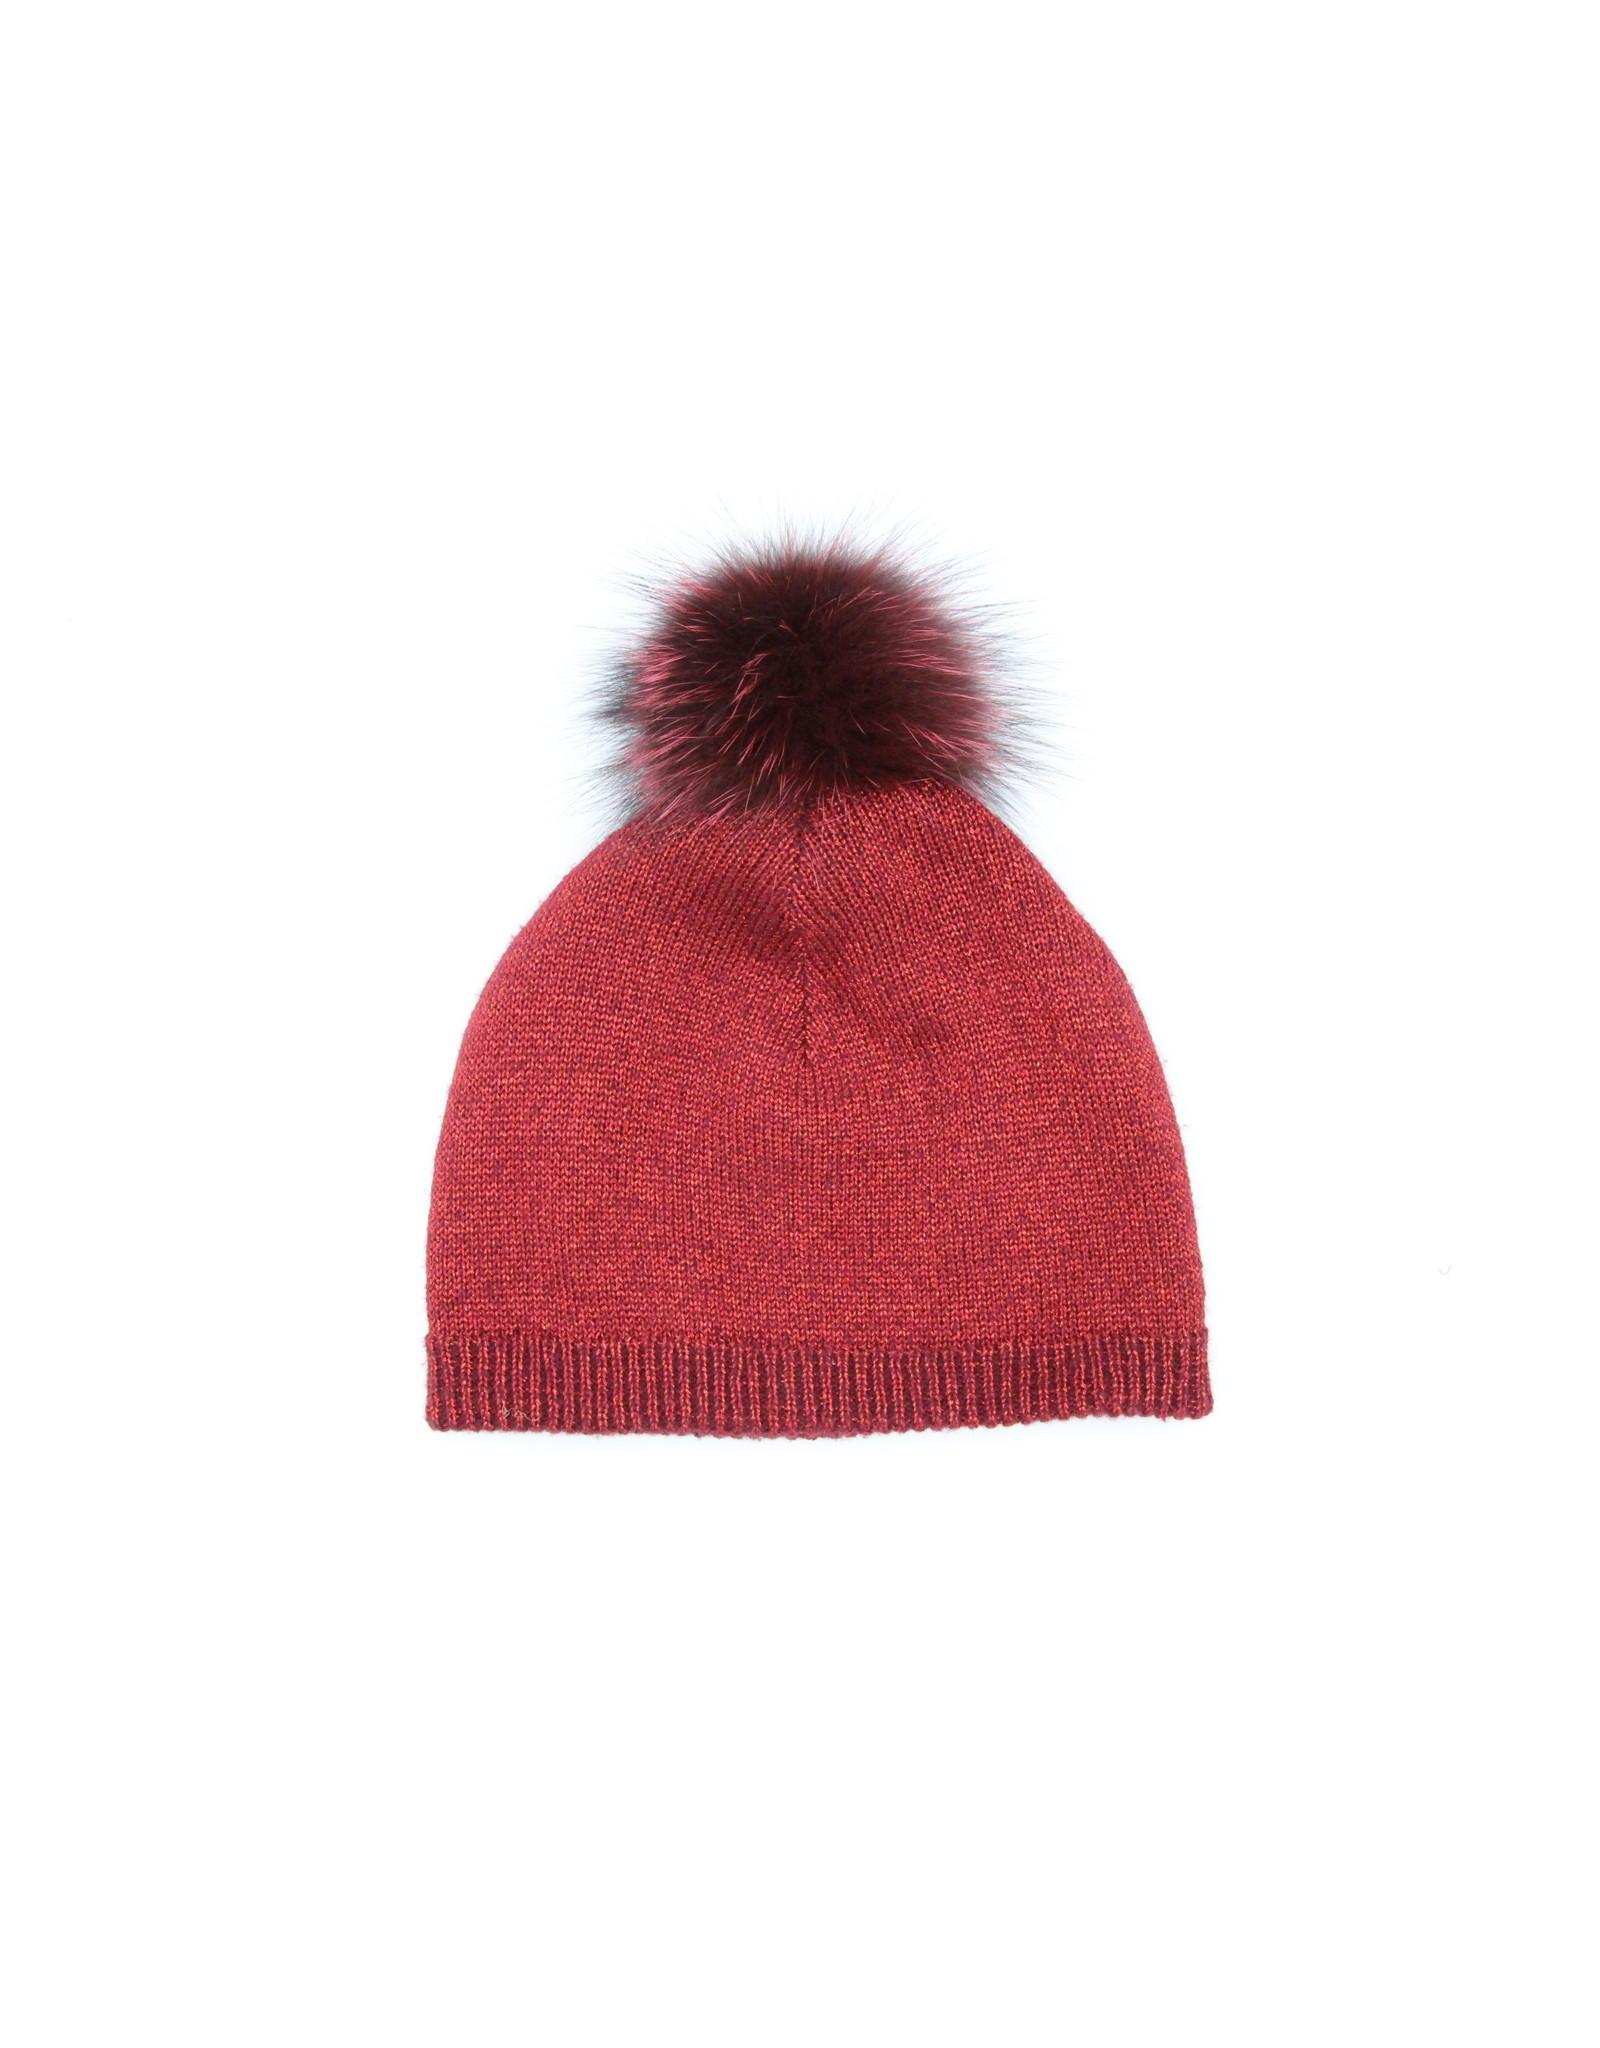 Reversible Sparkle Hat - HTIM07